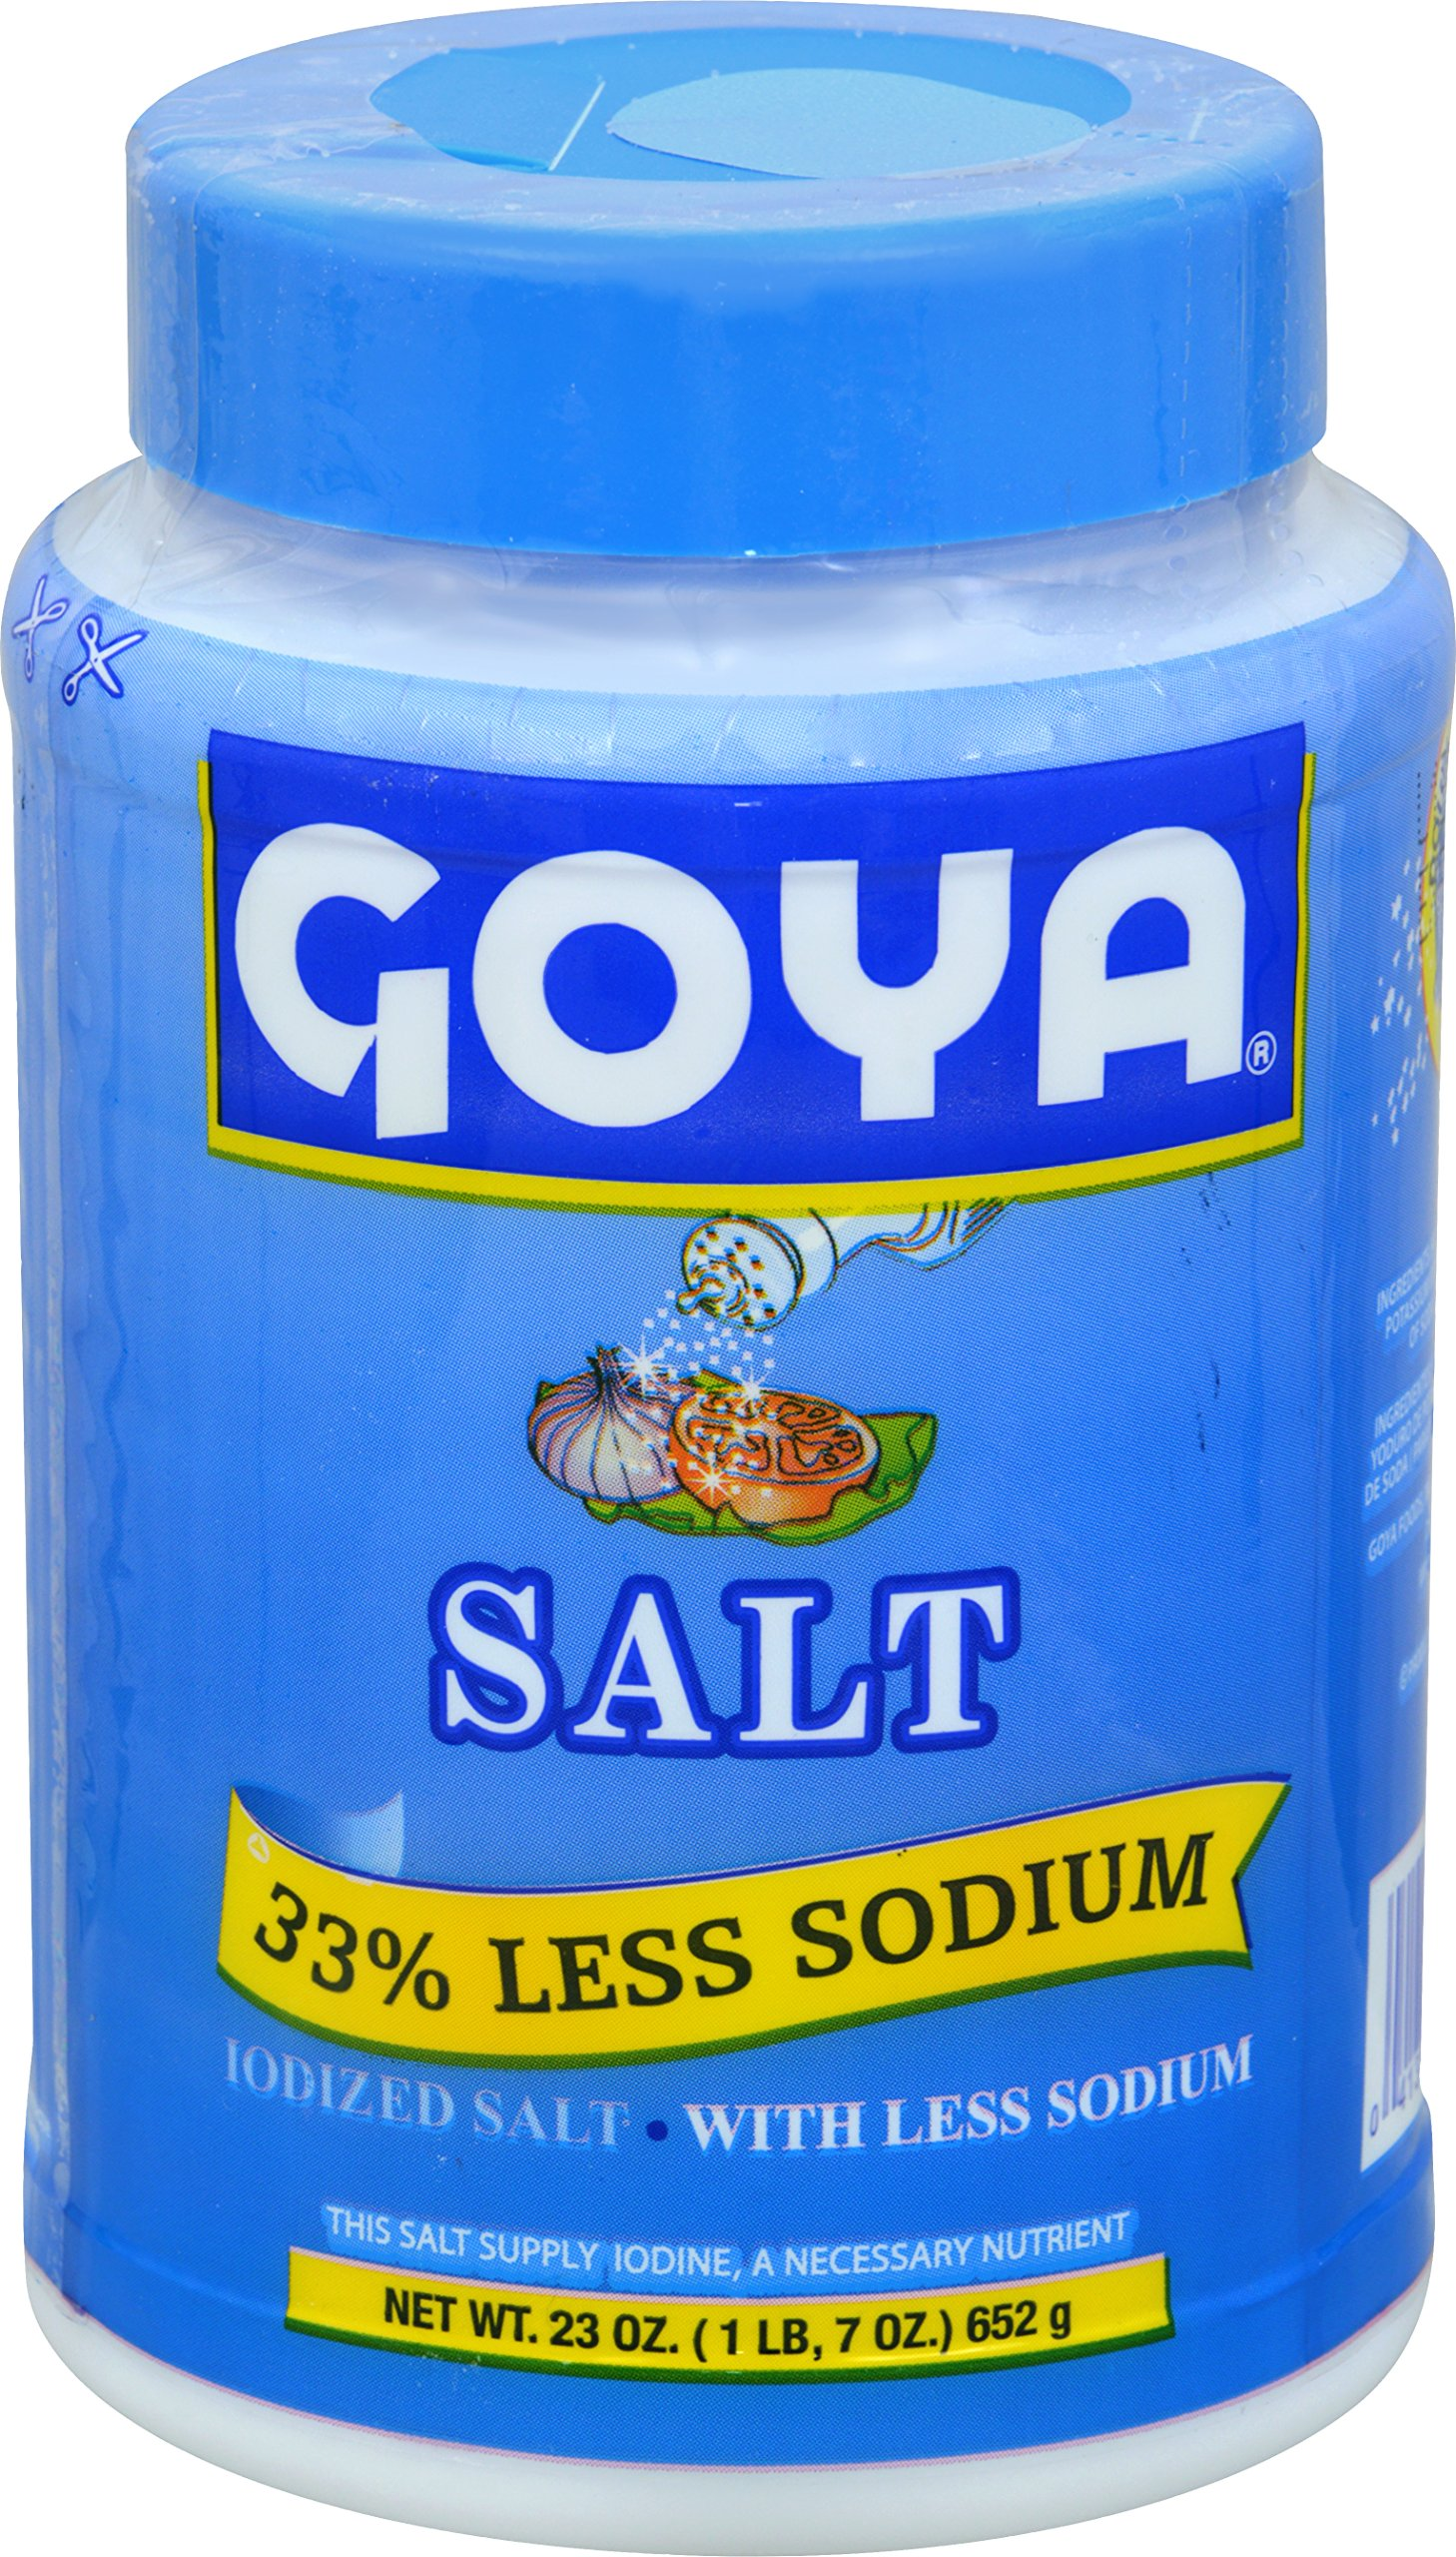 Goya Foods Salt 33% Less Sodium, 23 Ounce (Pack of 12)